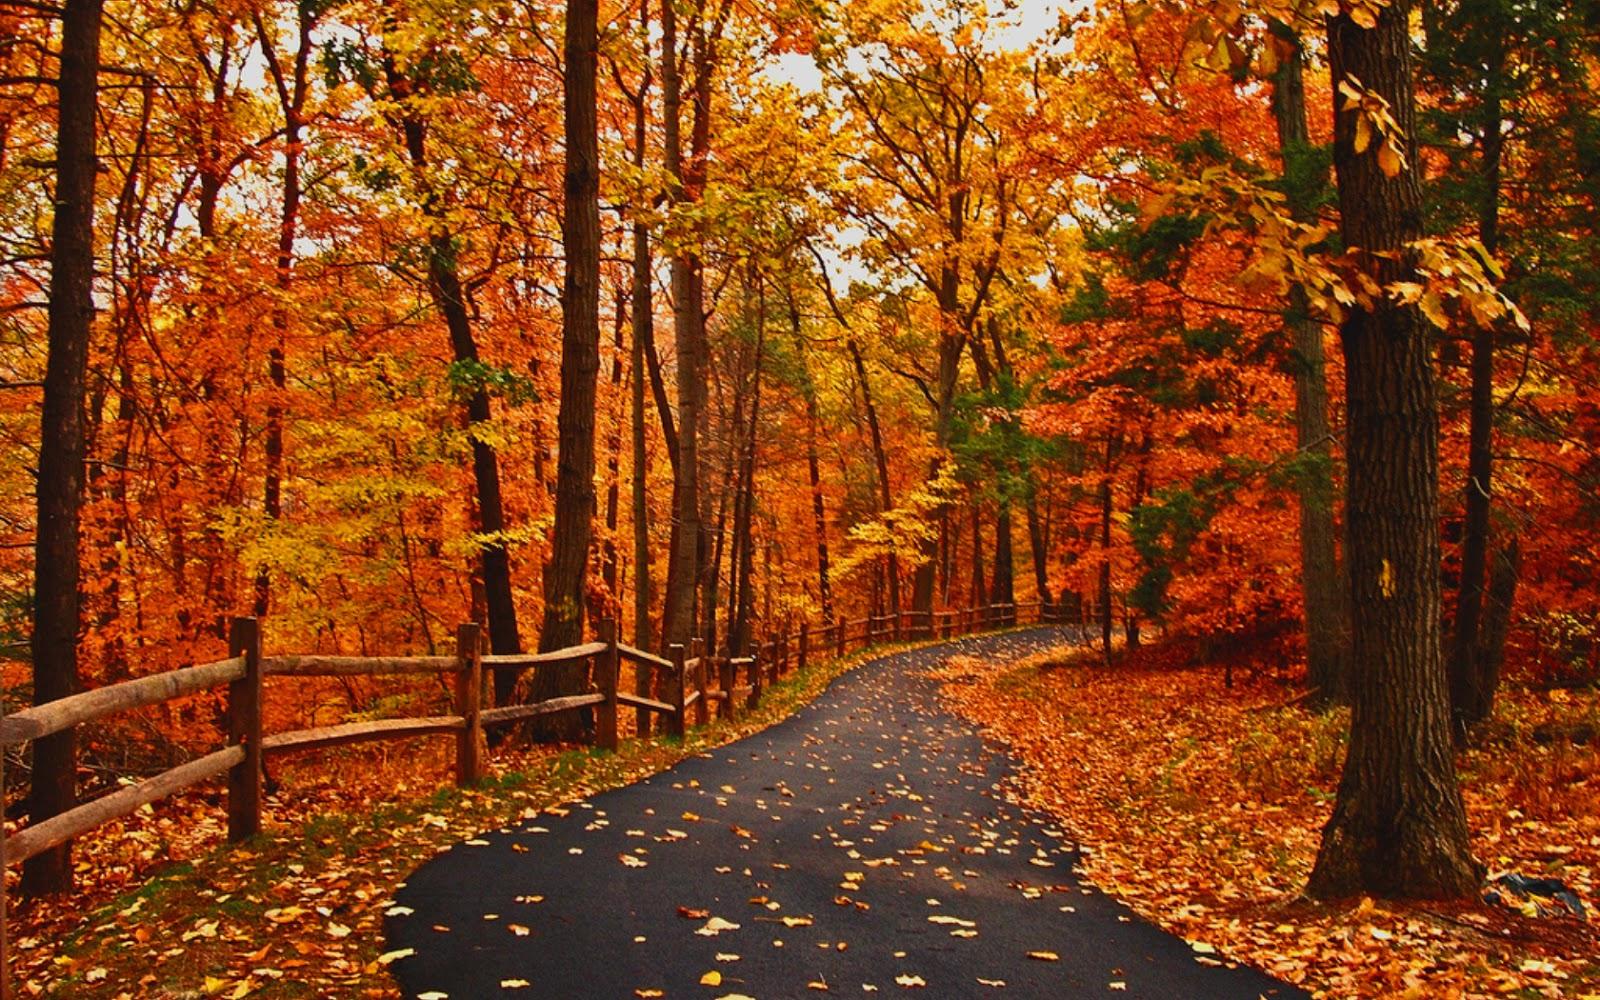 autumn_road_nice_leaves_pretty_landscape_colors-hd-wallpaper-469011